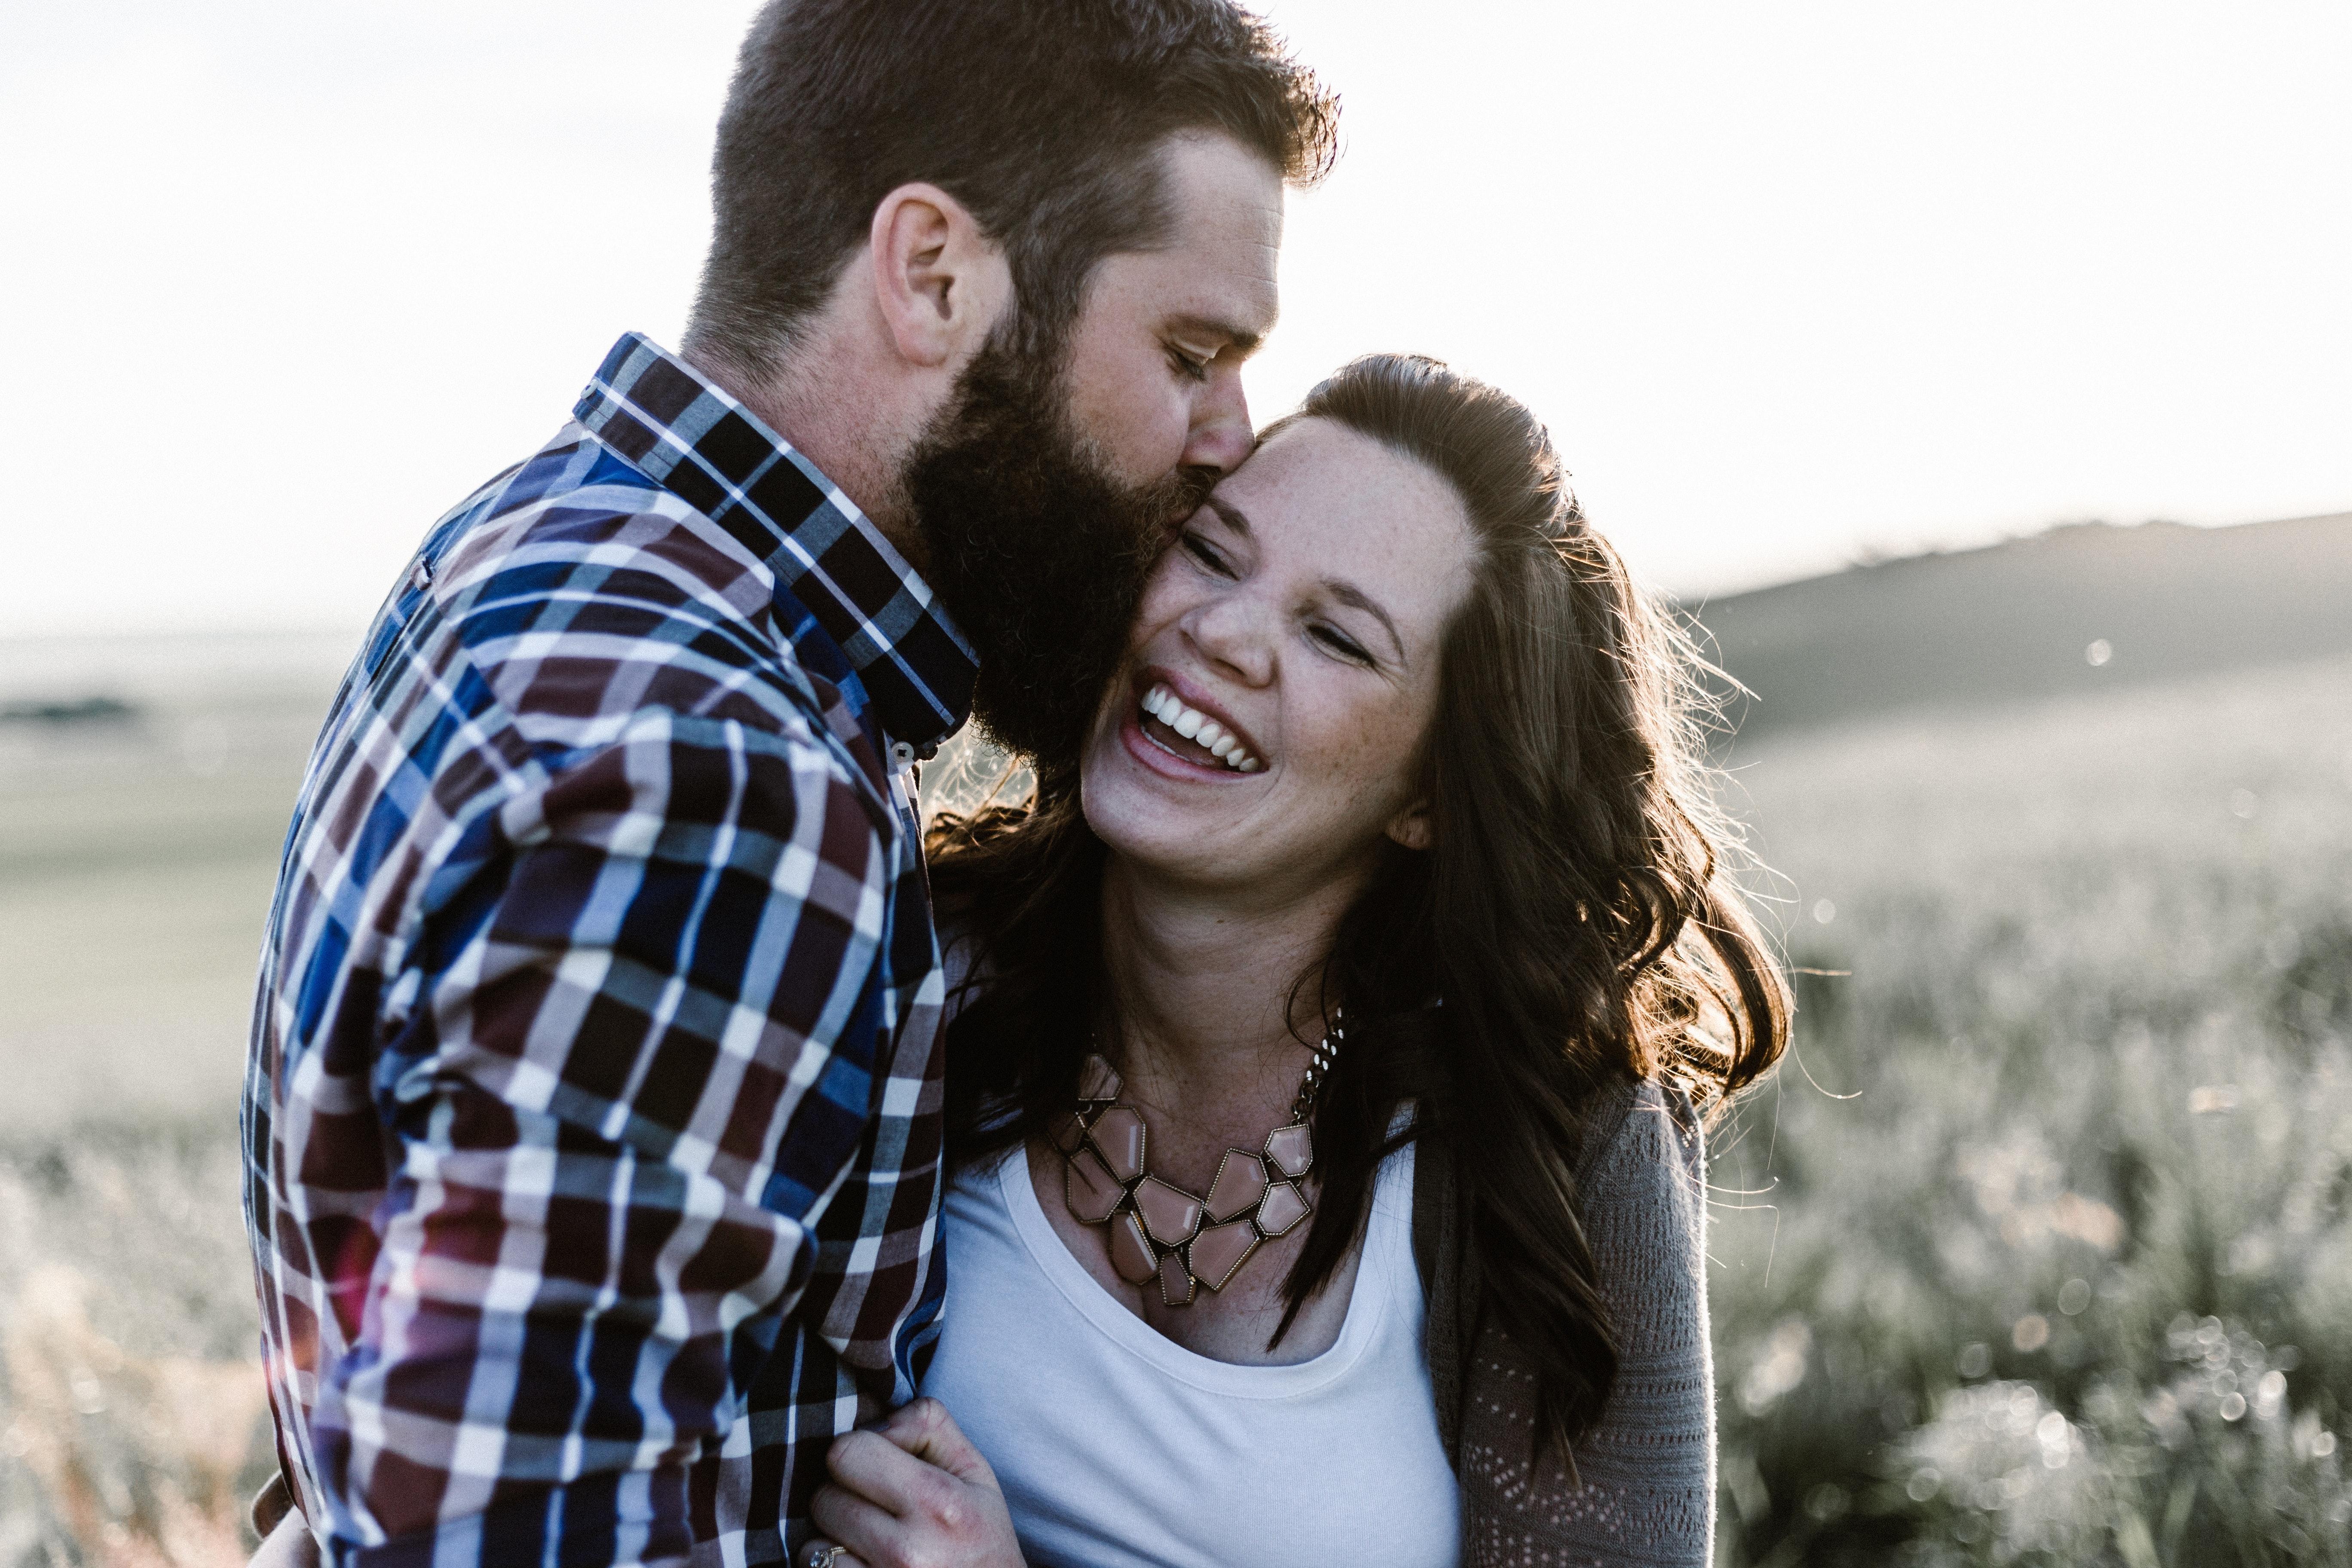 Utroskab dating site